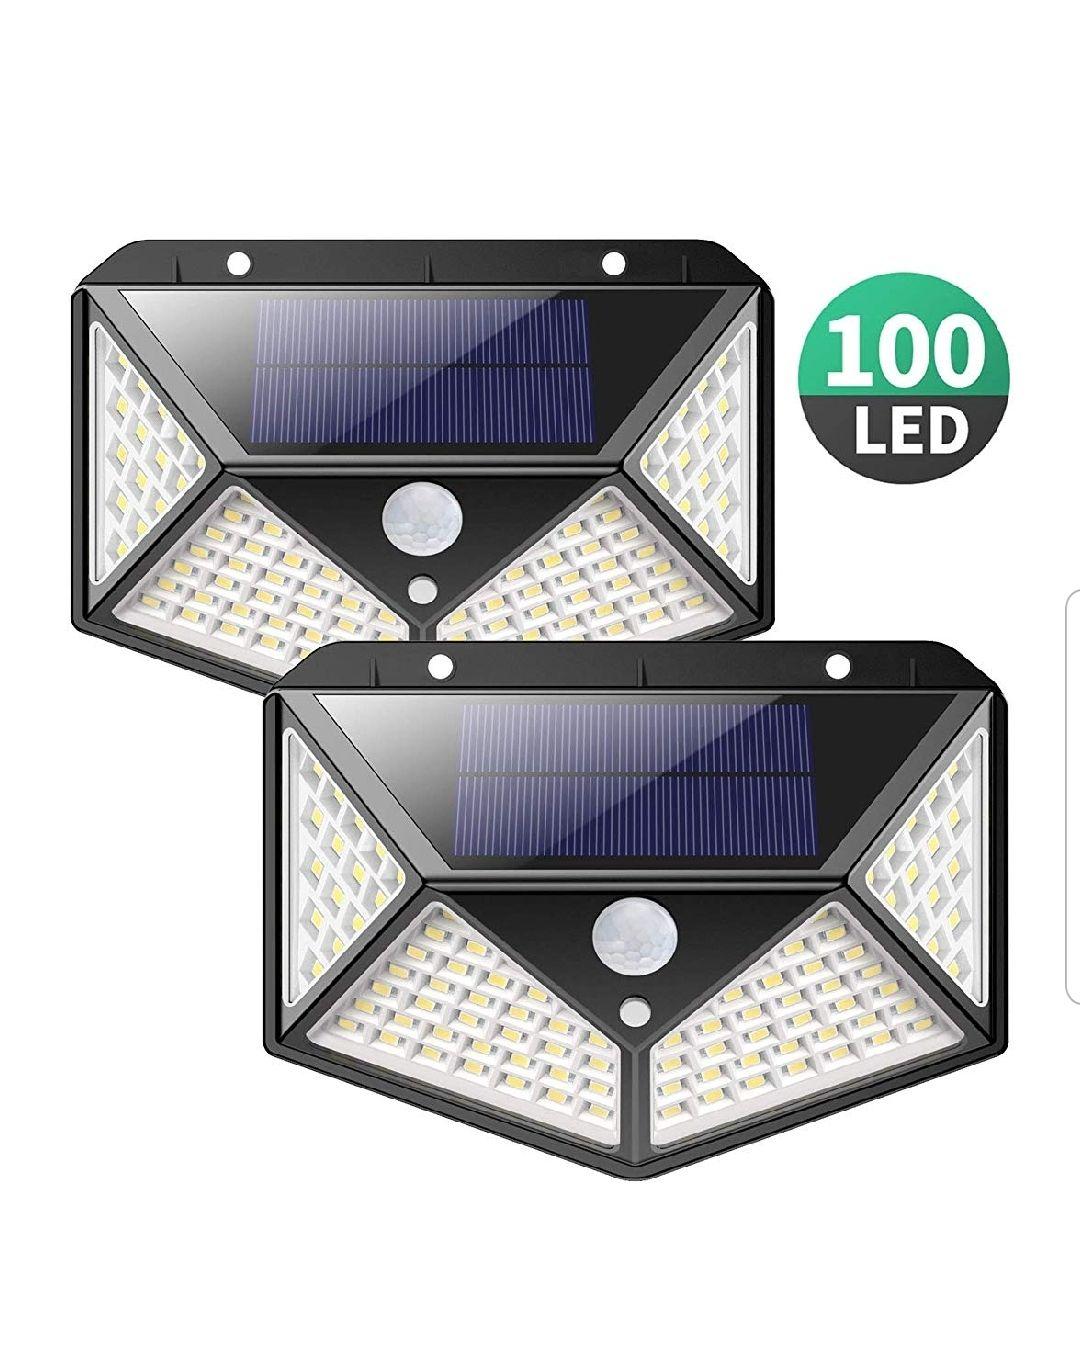 Luz solar exterior 100 led